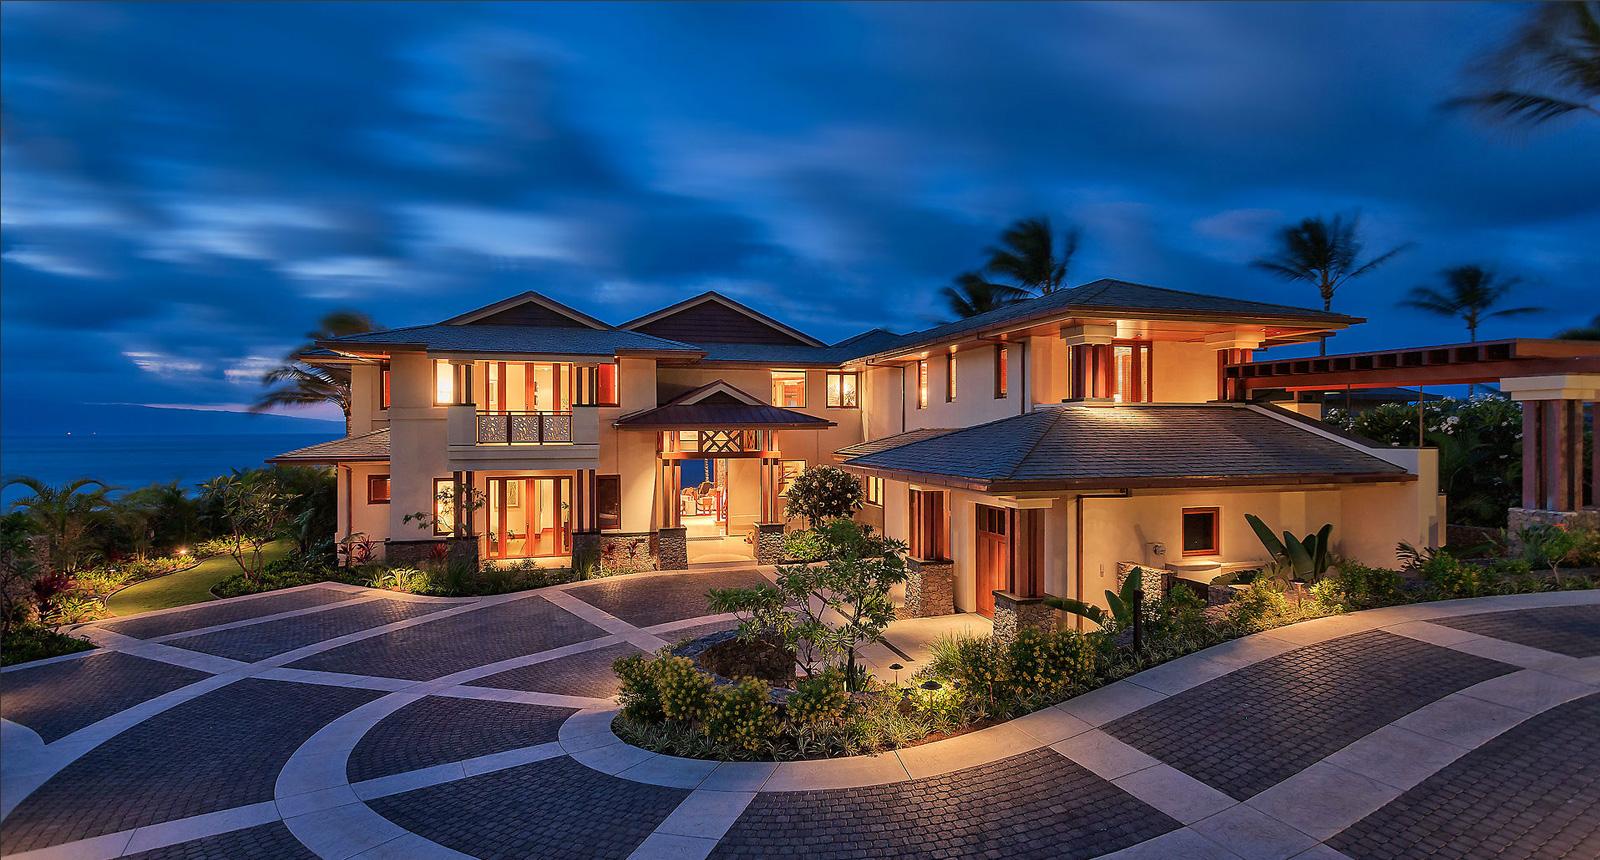 10 Attractive Beach House Design Ideas That